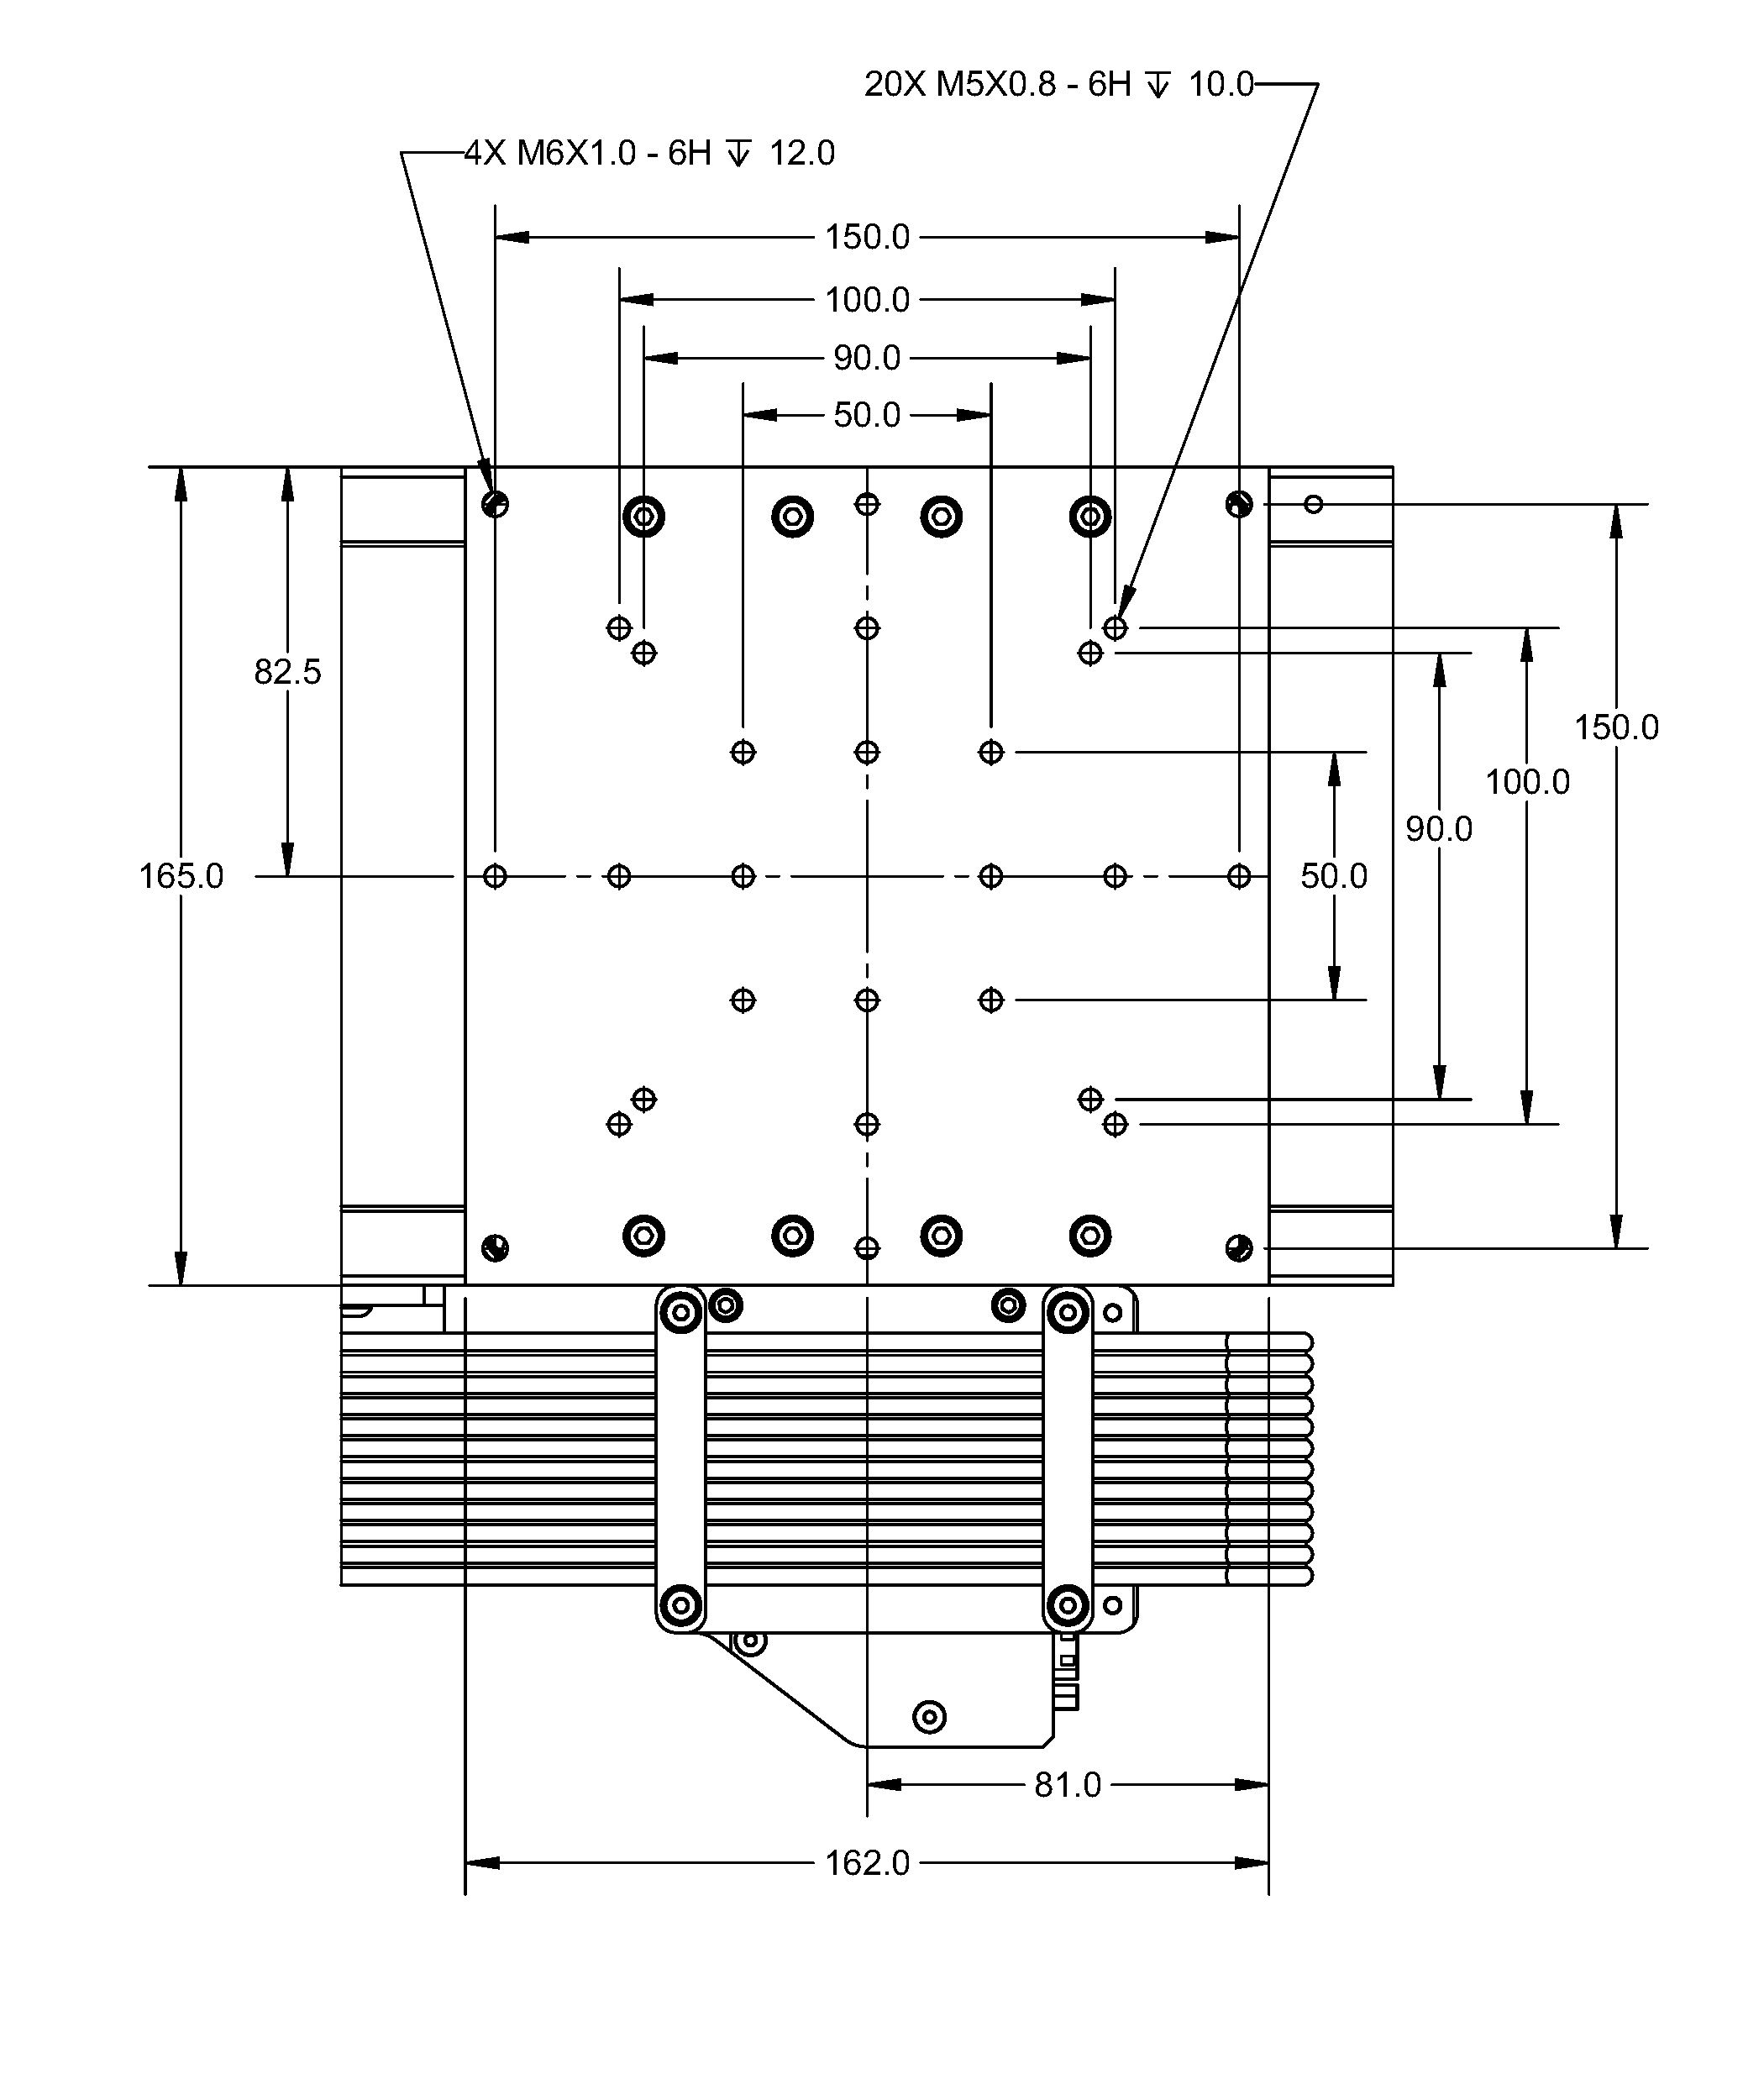 shunt trip coil diagram 1990 ford f250 wiring elevator breaker wire square d